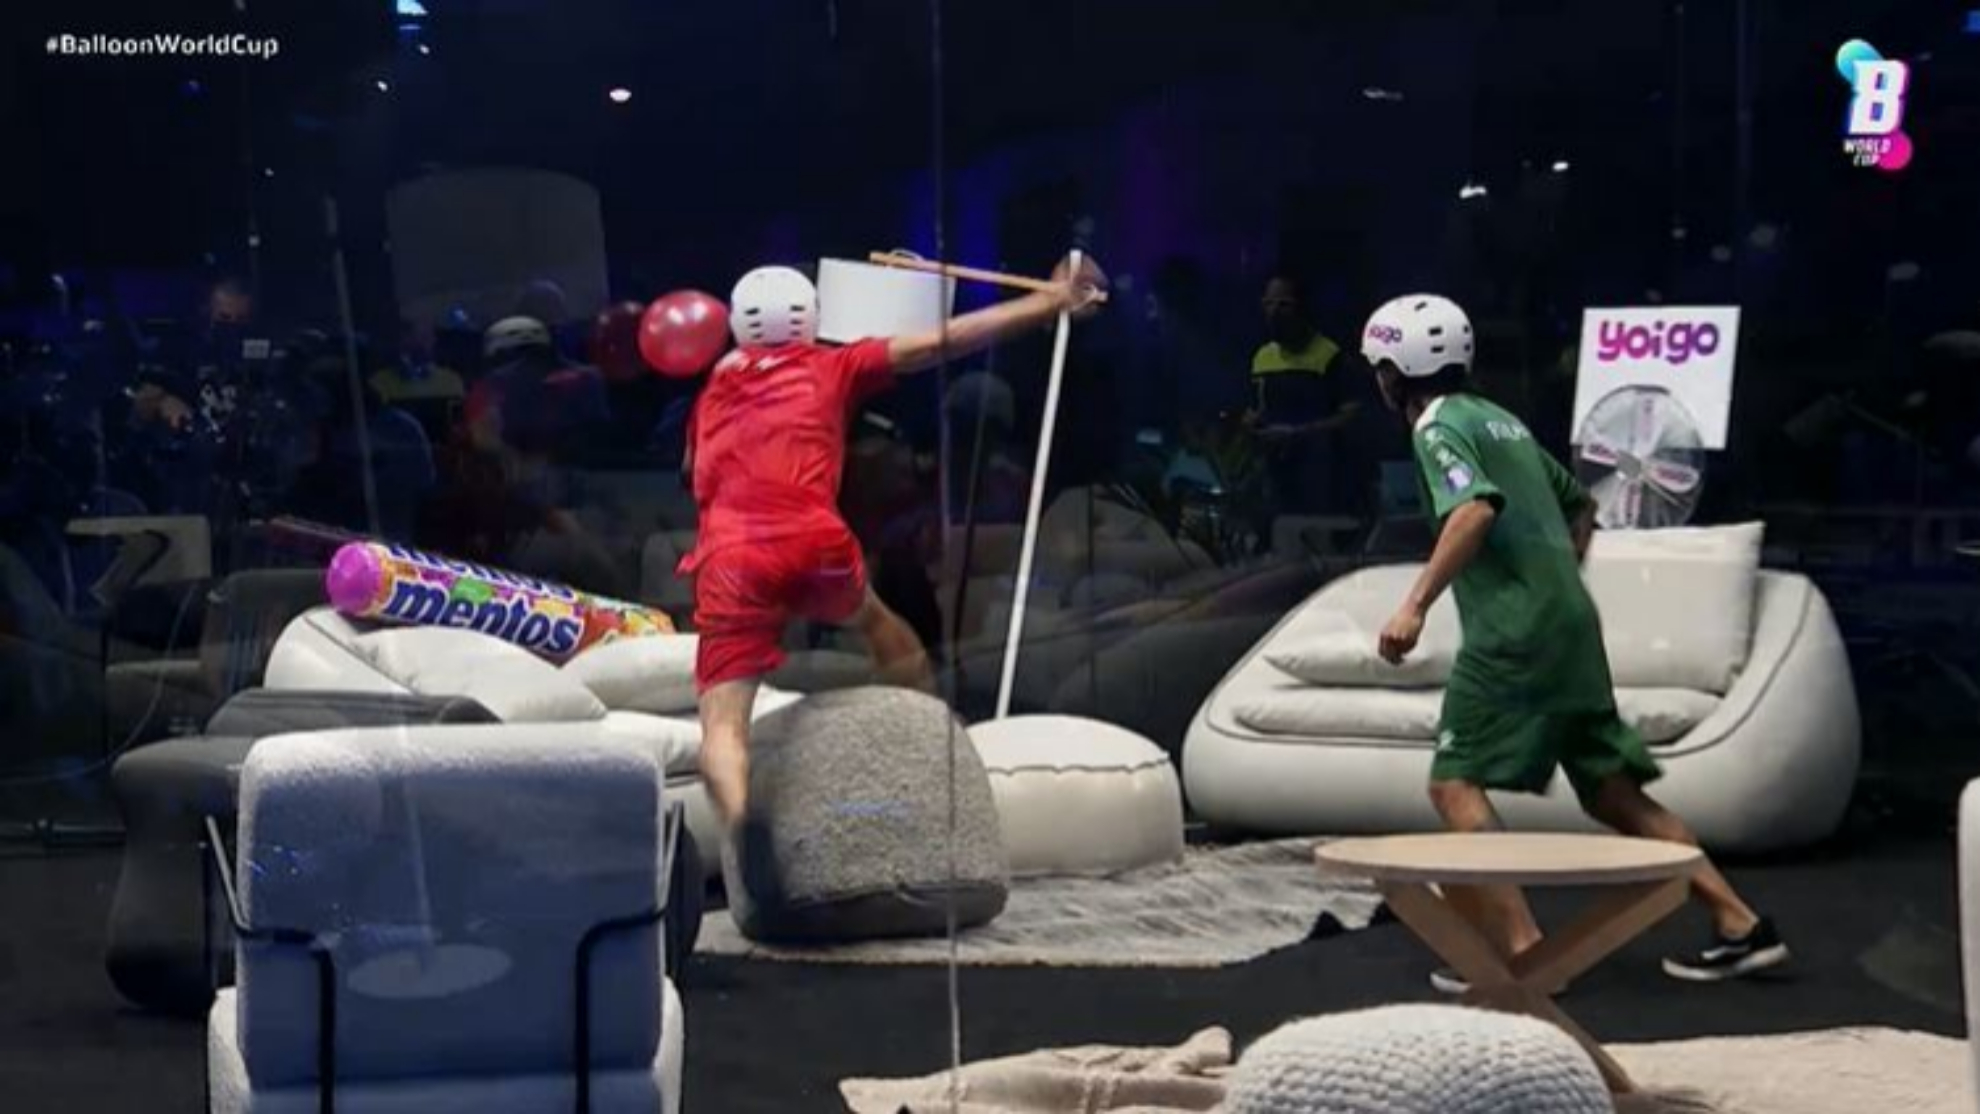 mongolia balloon world cup